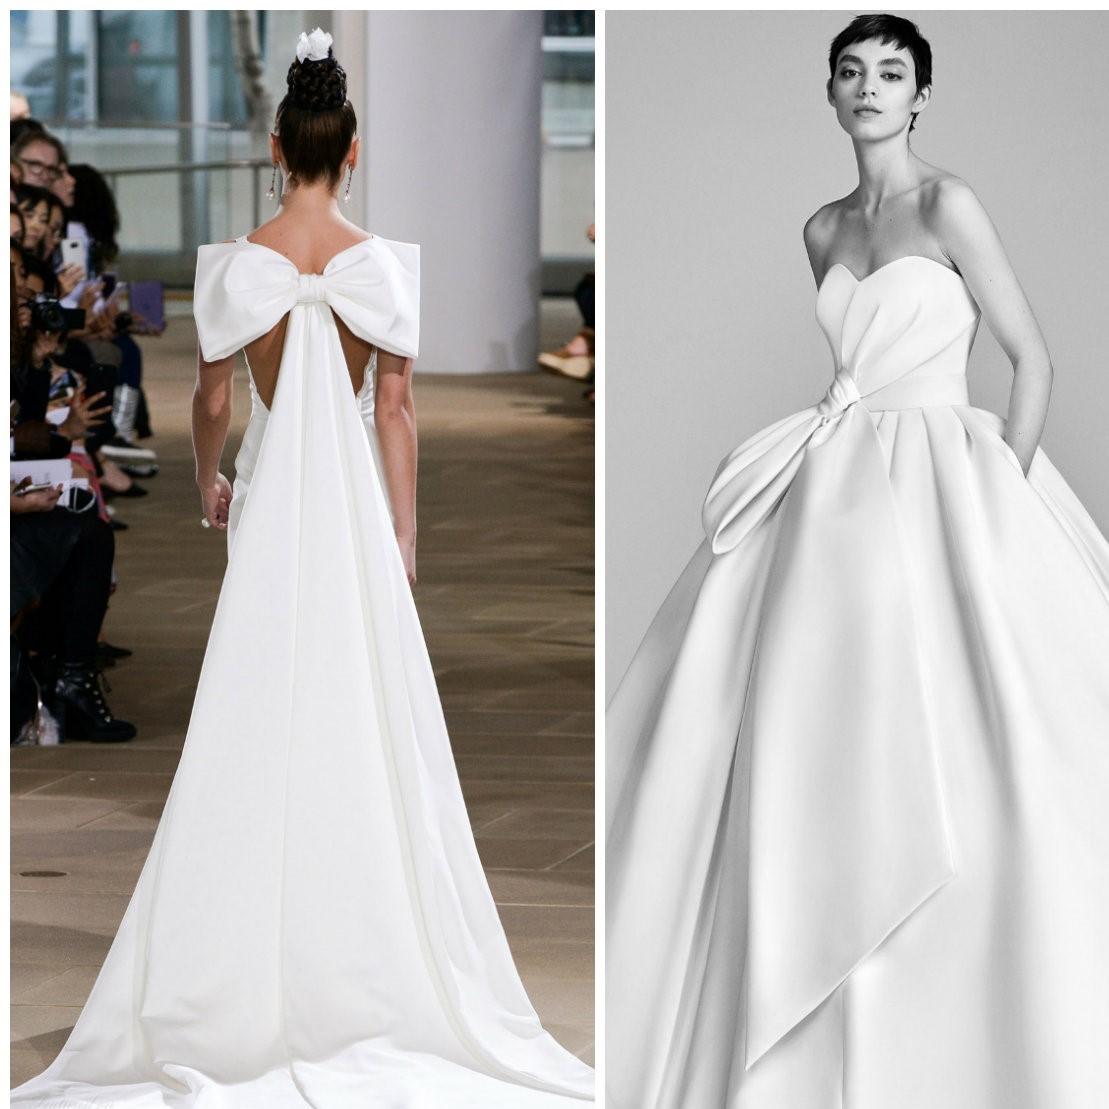 vestido de noiva 2018, vestido com laco